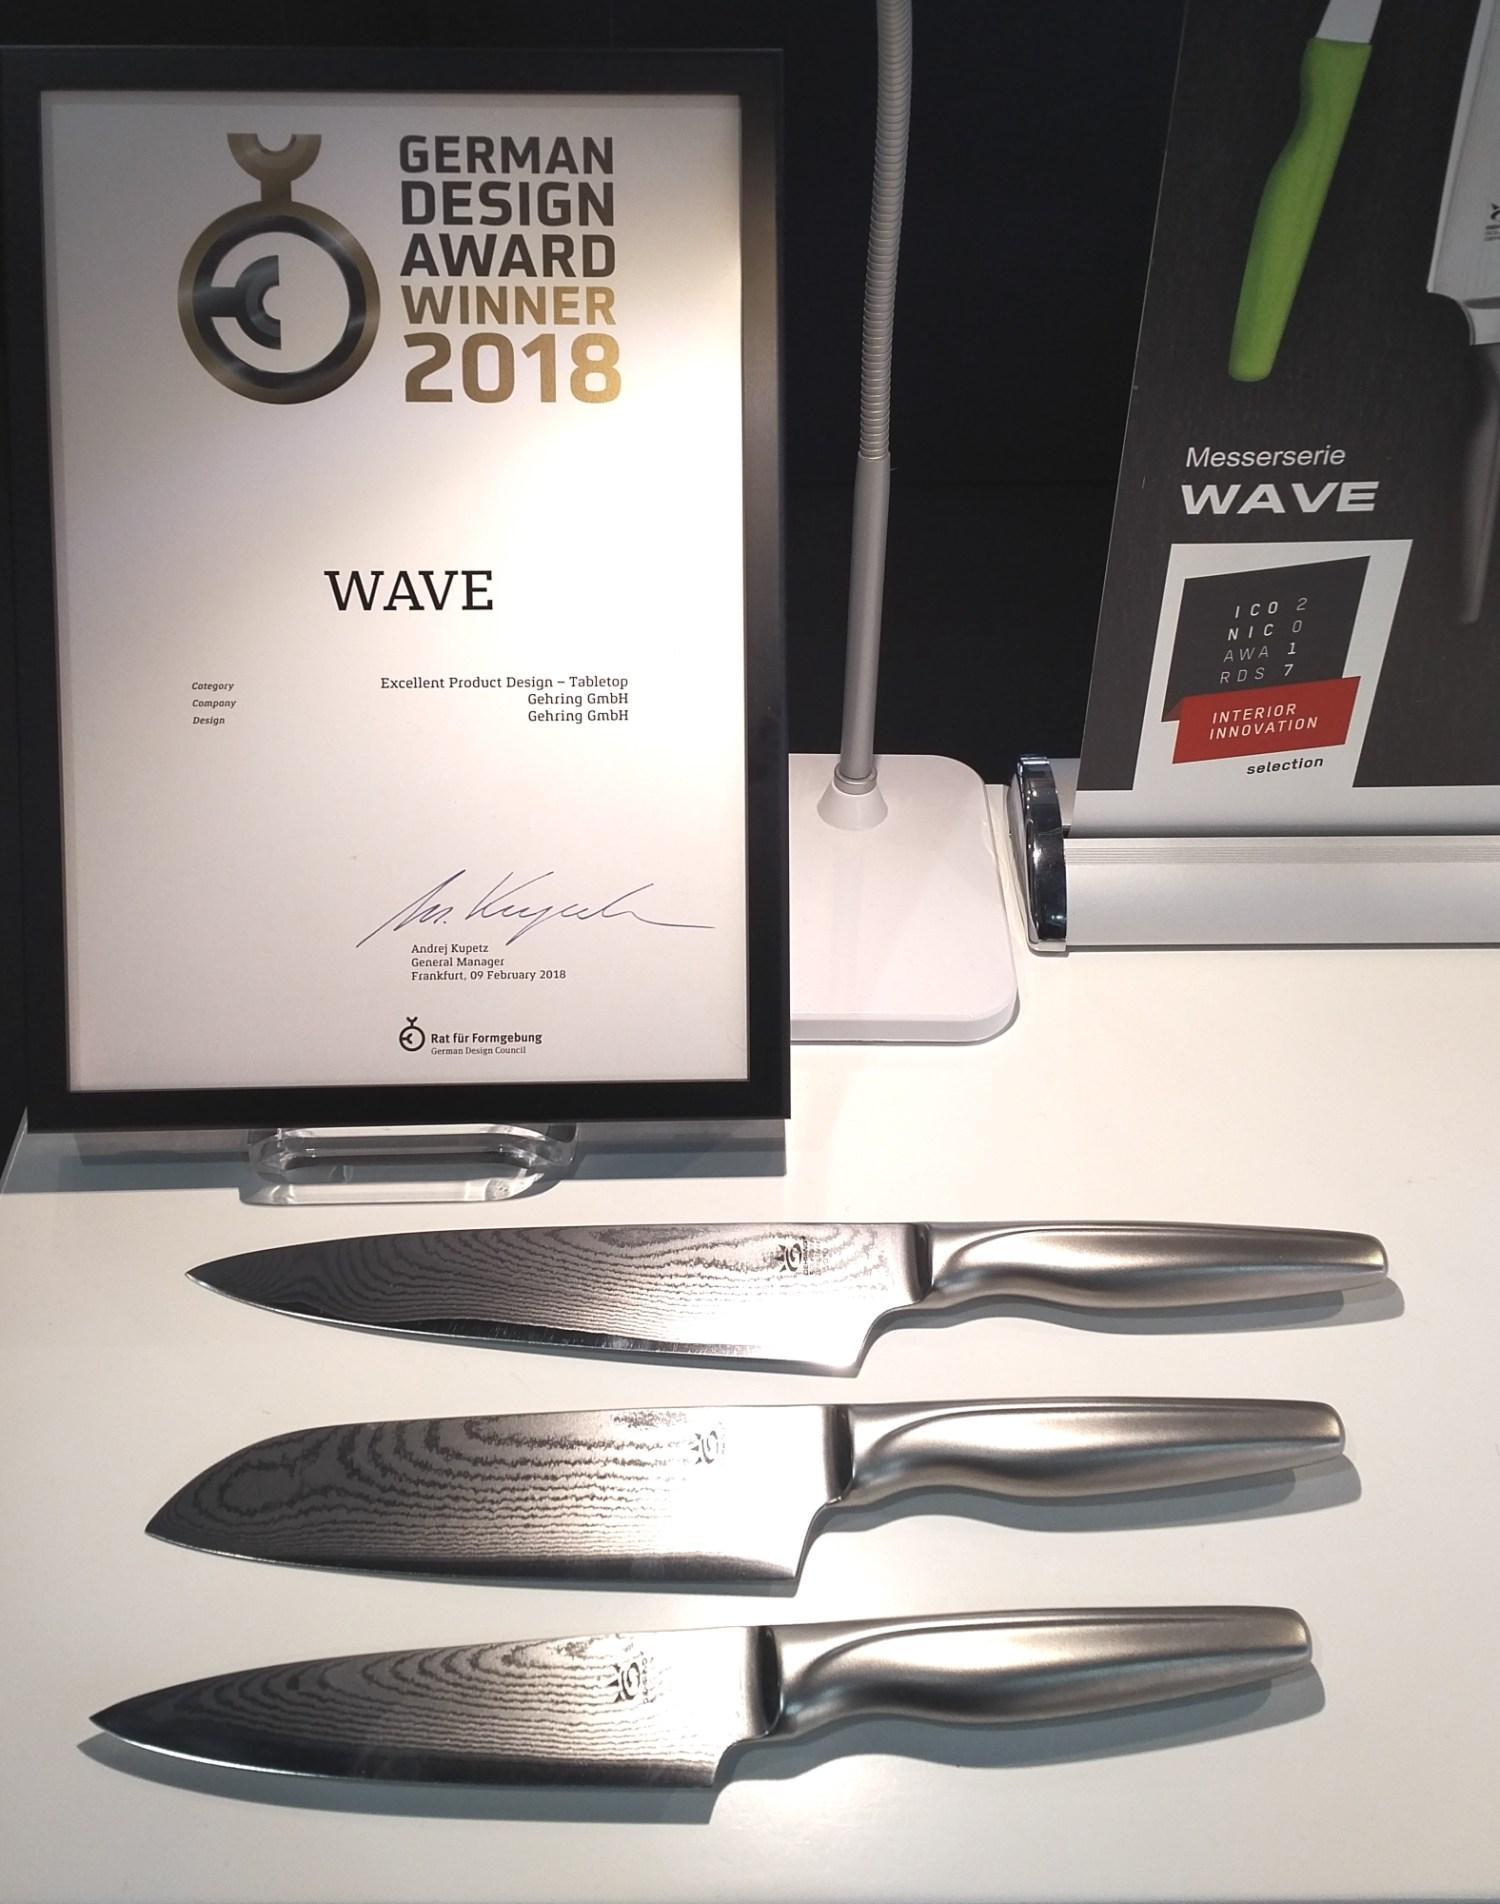 "Manufakturen-Blog: Gehrings Messerserie ""Wave"" gewann den German Design Award 2018 (Foto: Wigmar Bressel)"